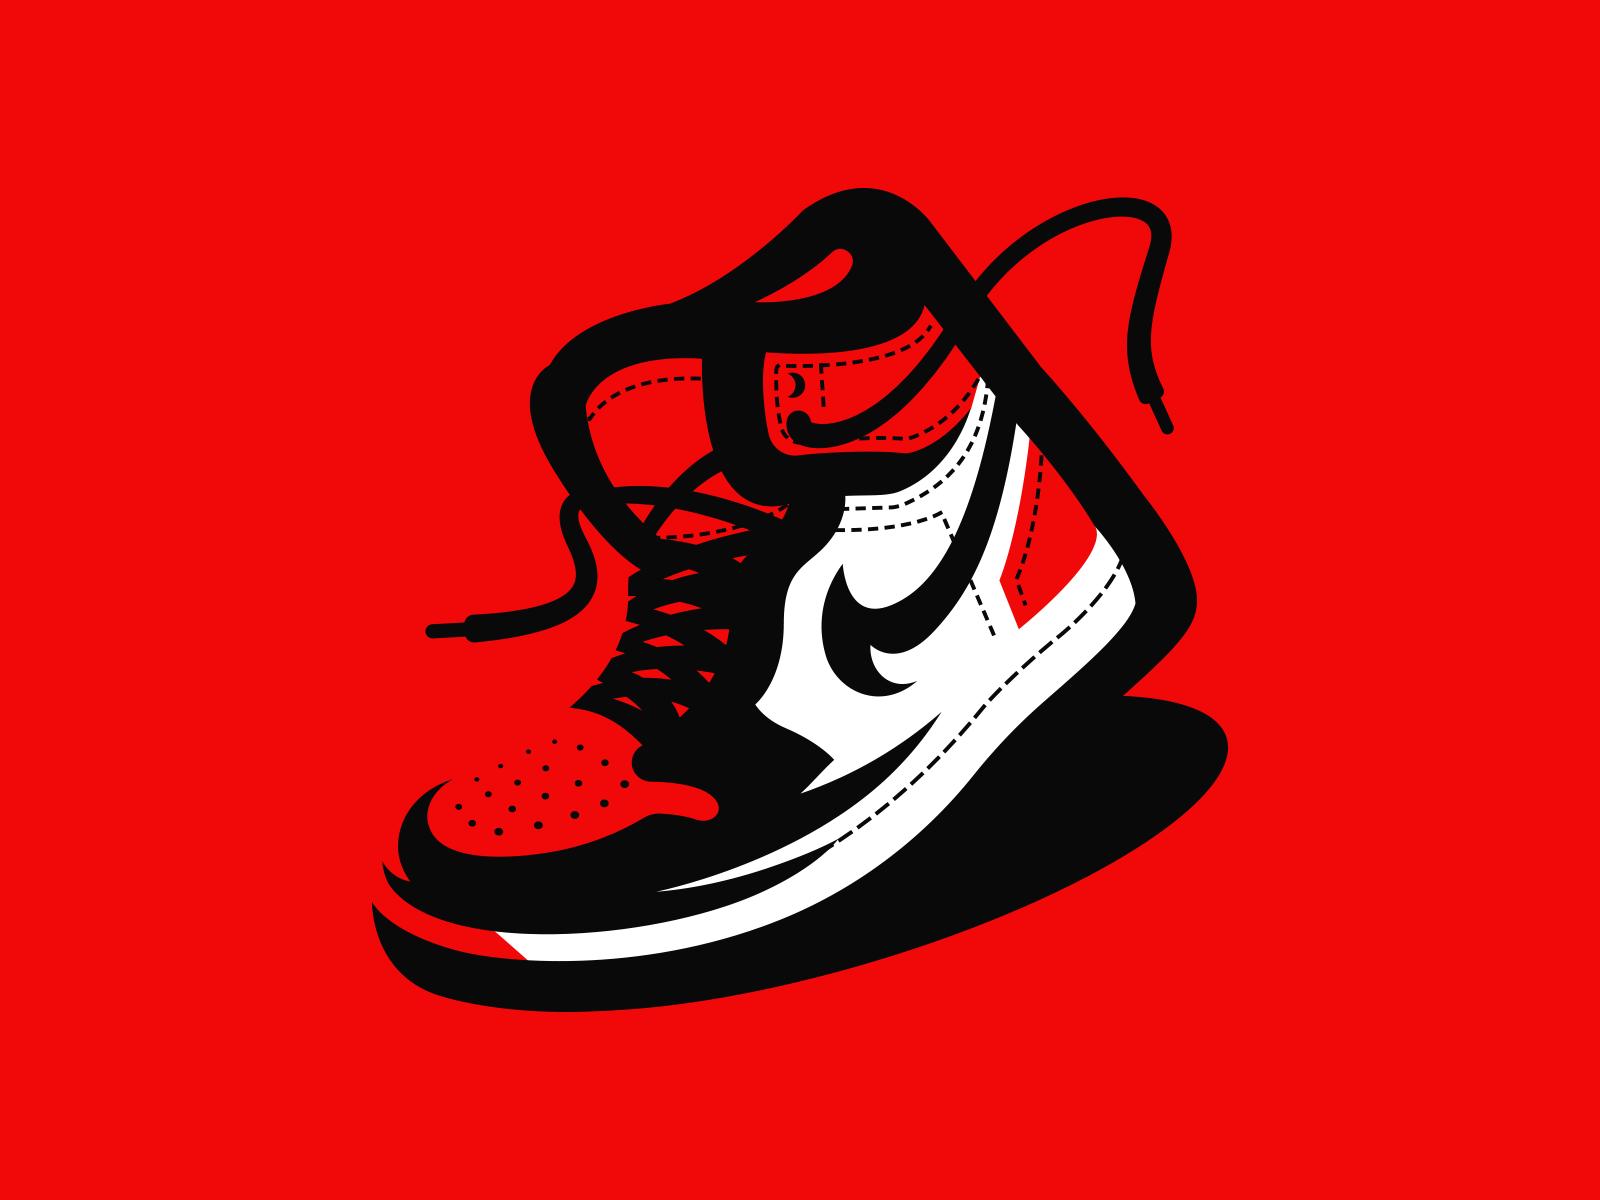 Michael Jordan Red And Black Background